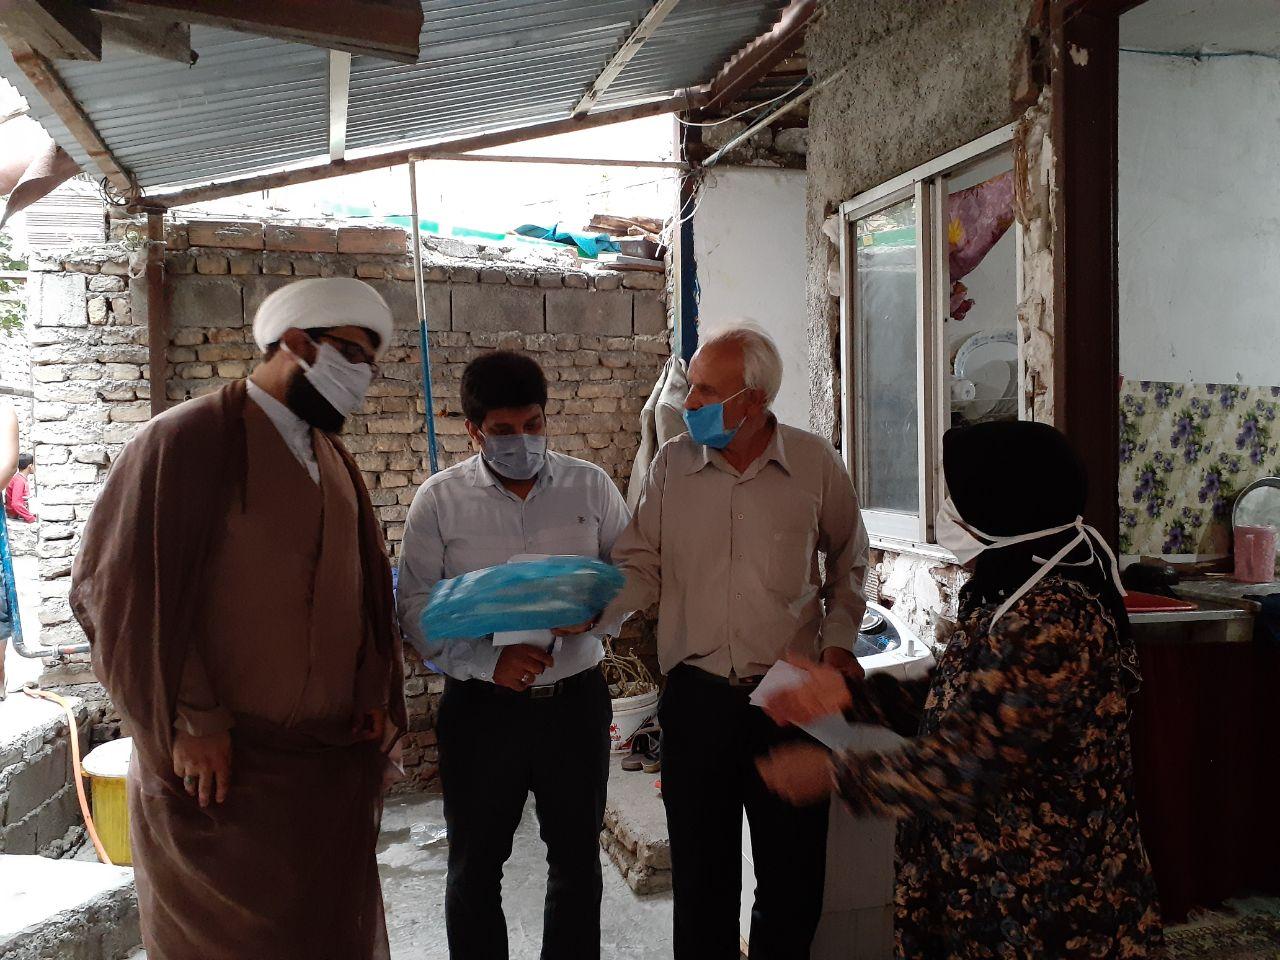 IMG 20200817 190133 103 - توزیع یکصد بسته گوشت قرمز به همت کانون مسجد امام علی(ع) نکا در محرم